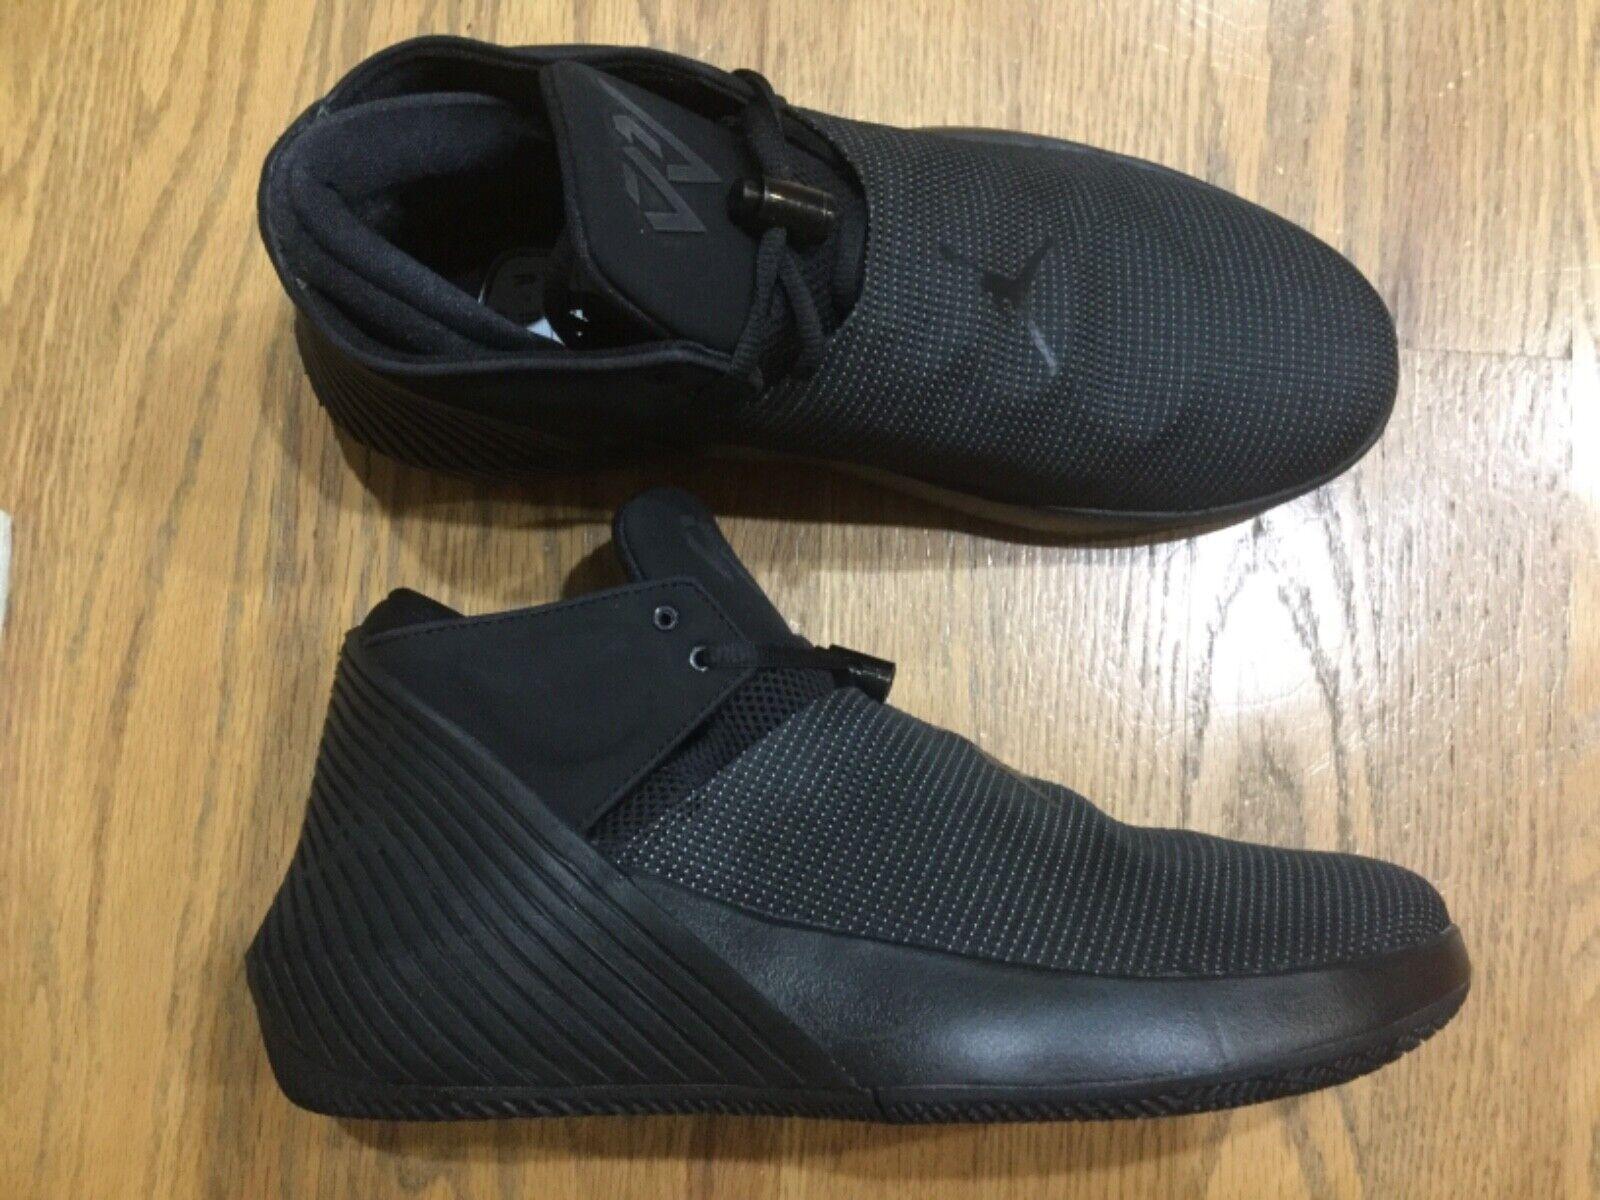 New men Nike Air JORDAN why not zero.1 low basketball shoes sneakers Sz 10.5 NIB